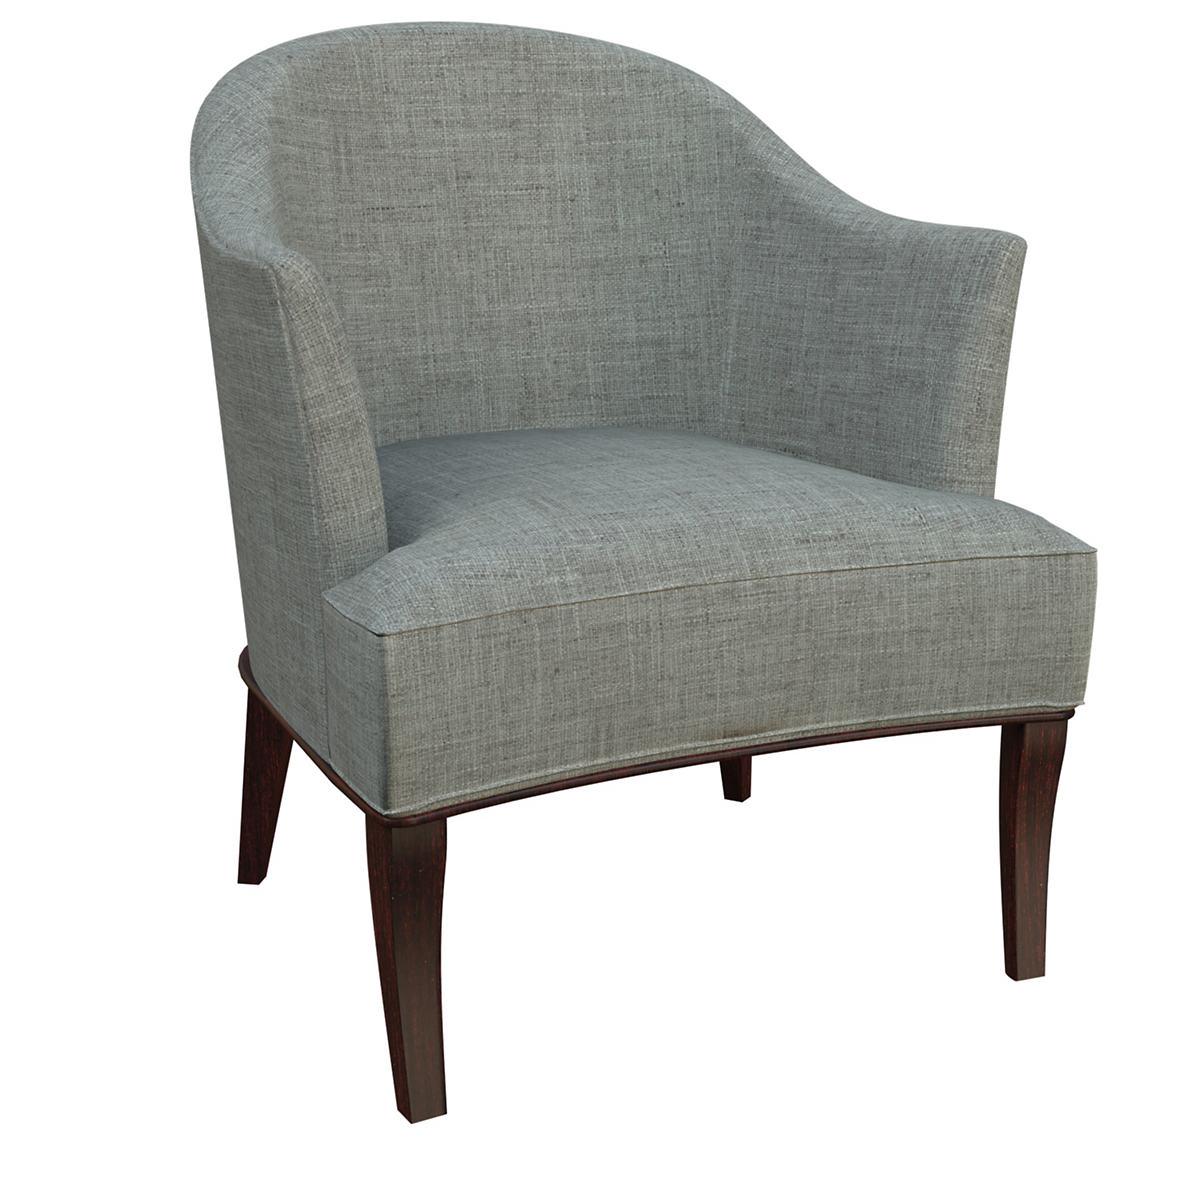 Canvasuede Ocean Lyon Chair